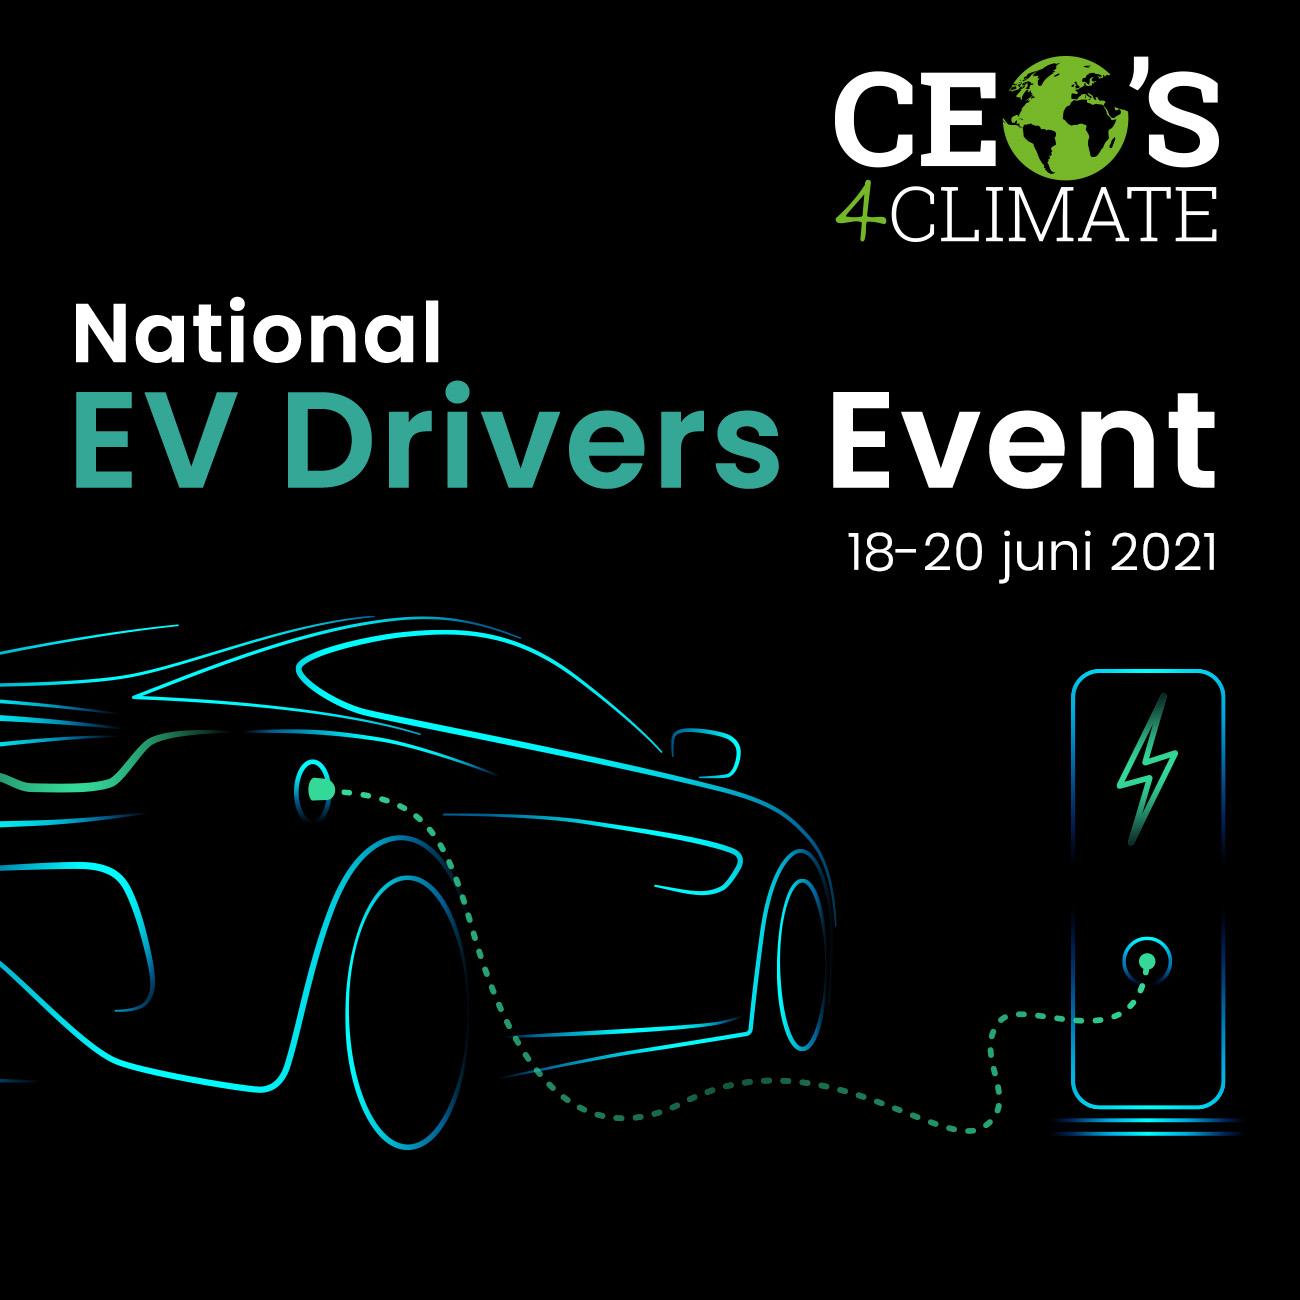 EV Drivers Event